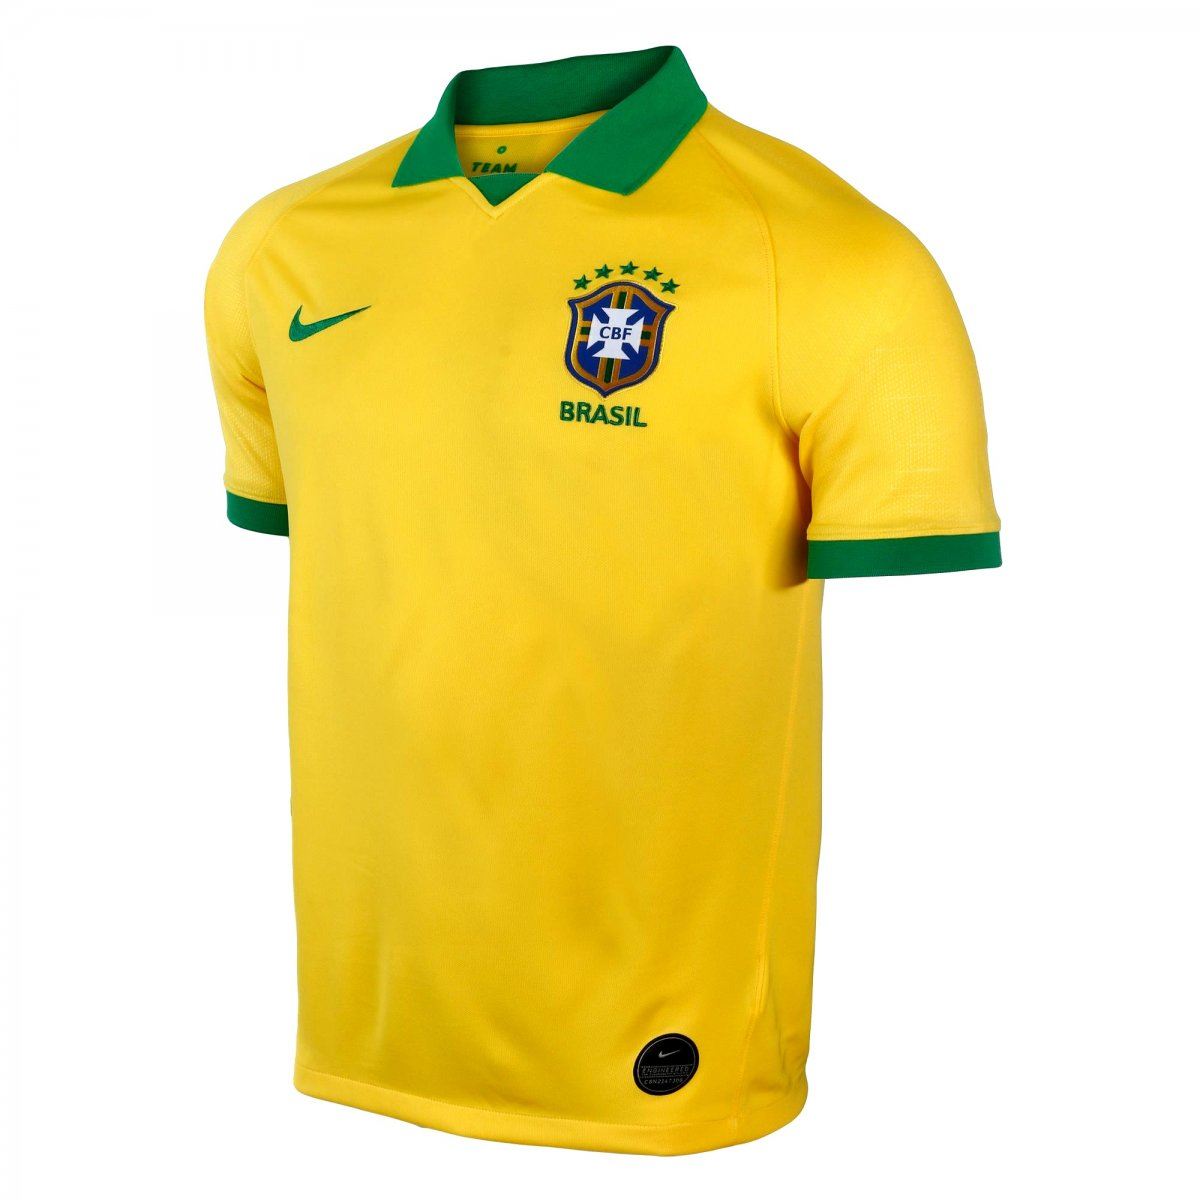 860395cf8c16b Amplie a imagem. Camisa Nike Brasil Comemorativa Copa América 2019 ...